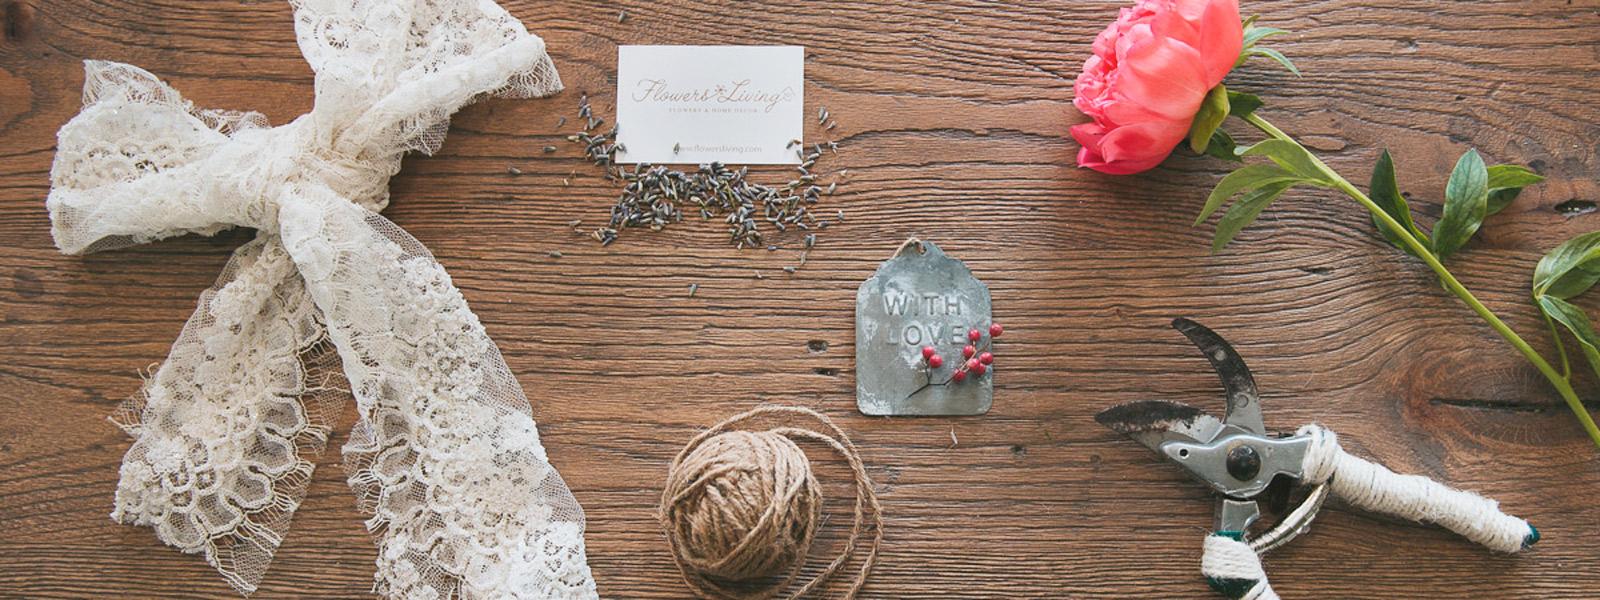 Flowers Living allestimenti floreali per matrimoni ed eventi